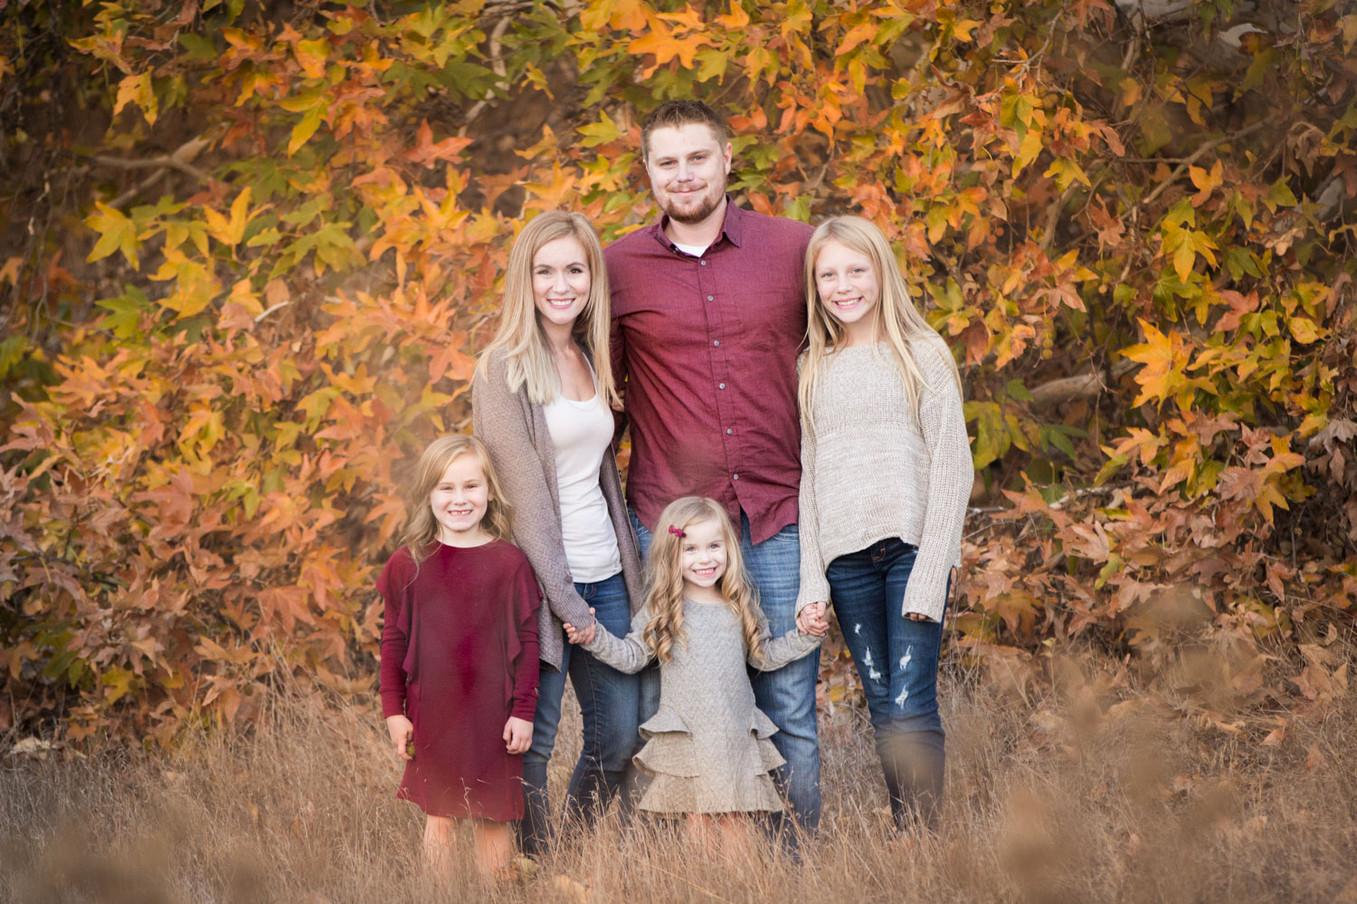 FamilyPortraits_Hansens122017-7463.jpg